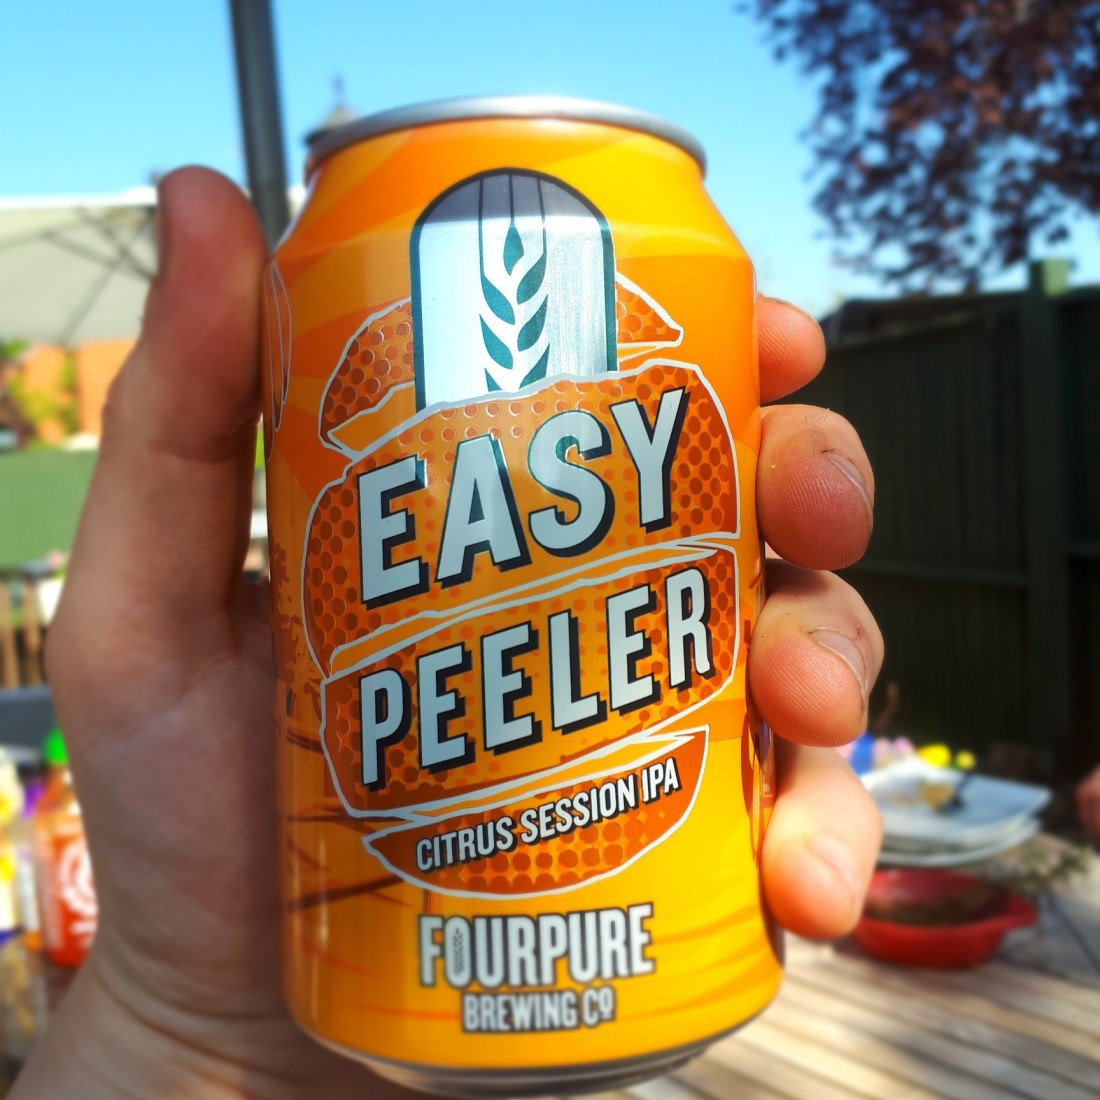 Flavourly_easy_peeler